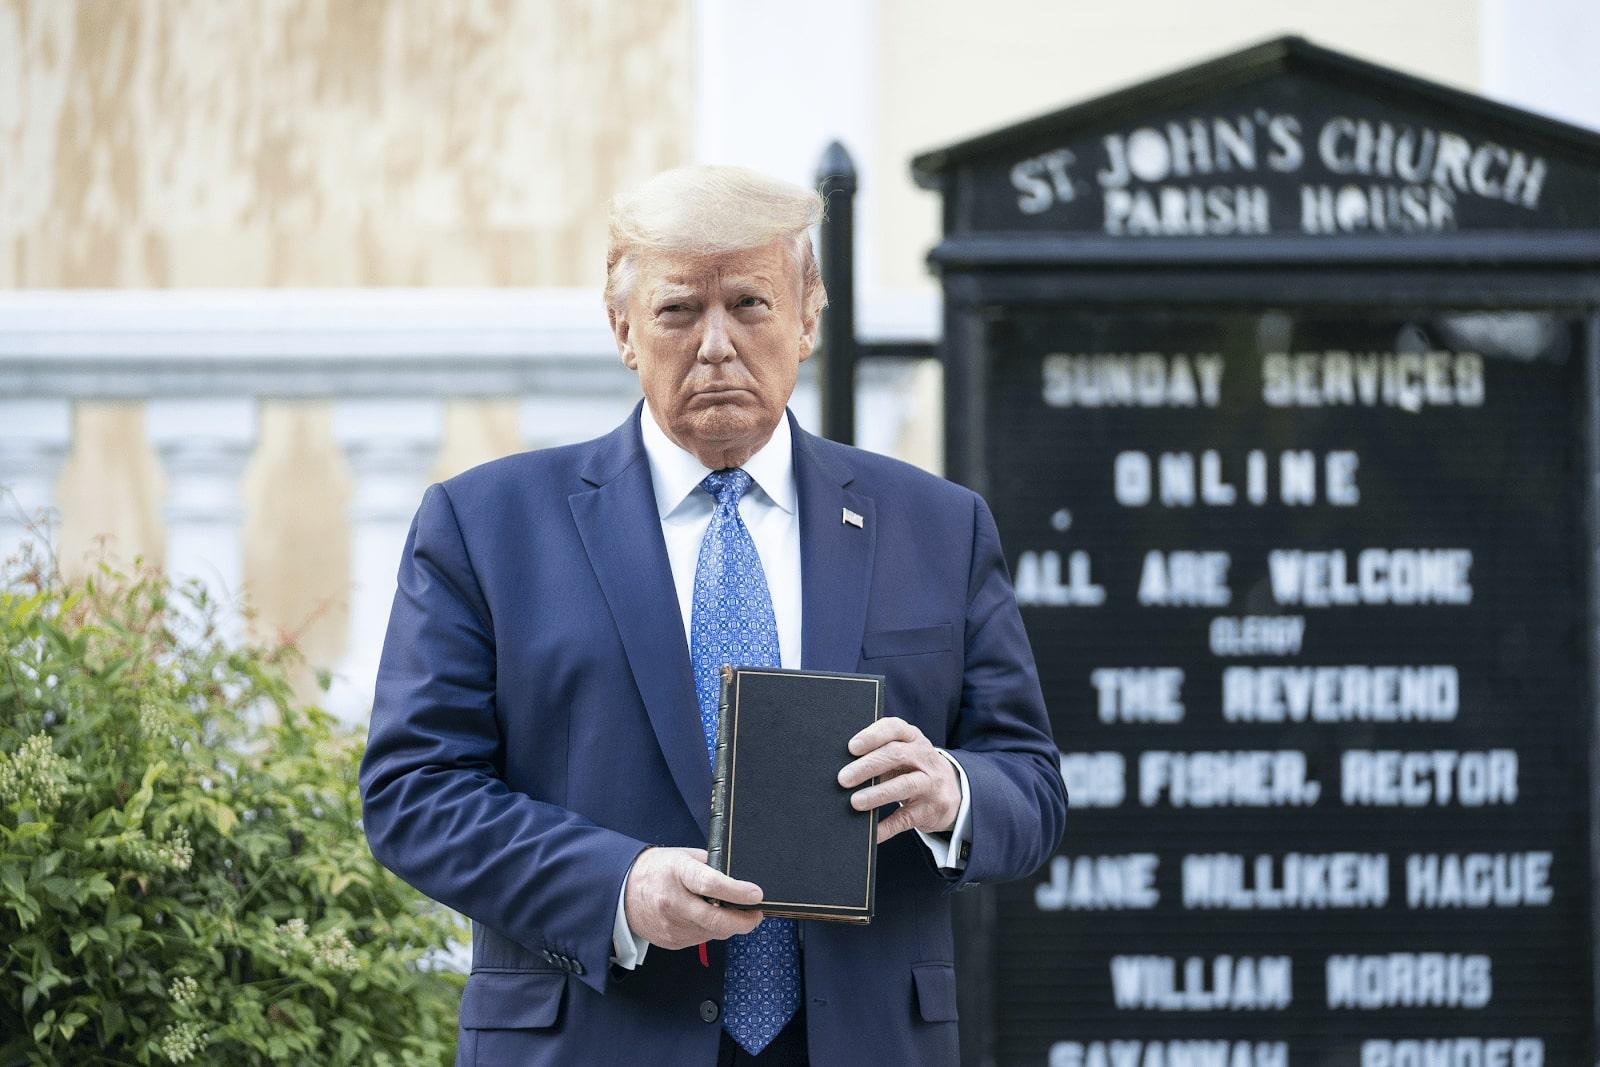 President Trump visits St. John Episcopal Church, Washington